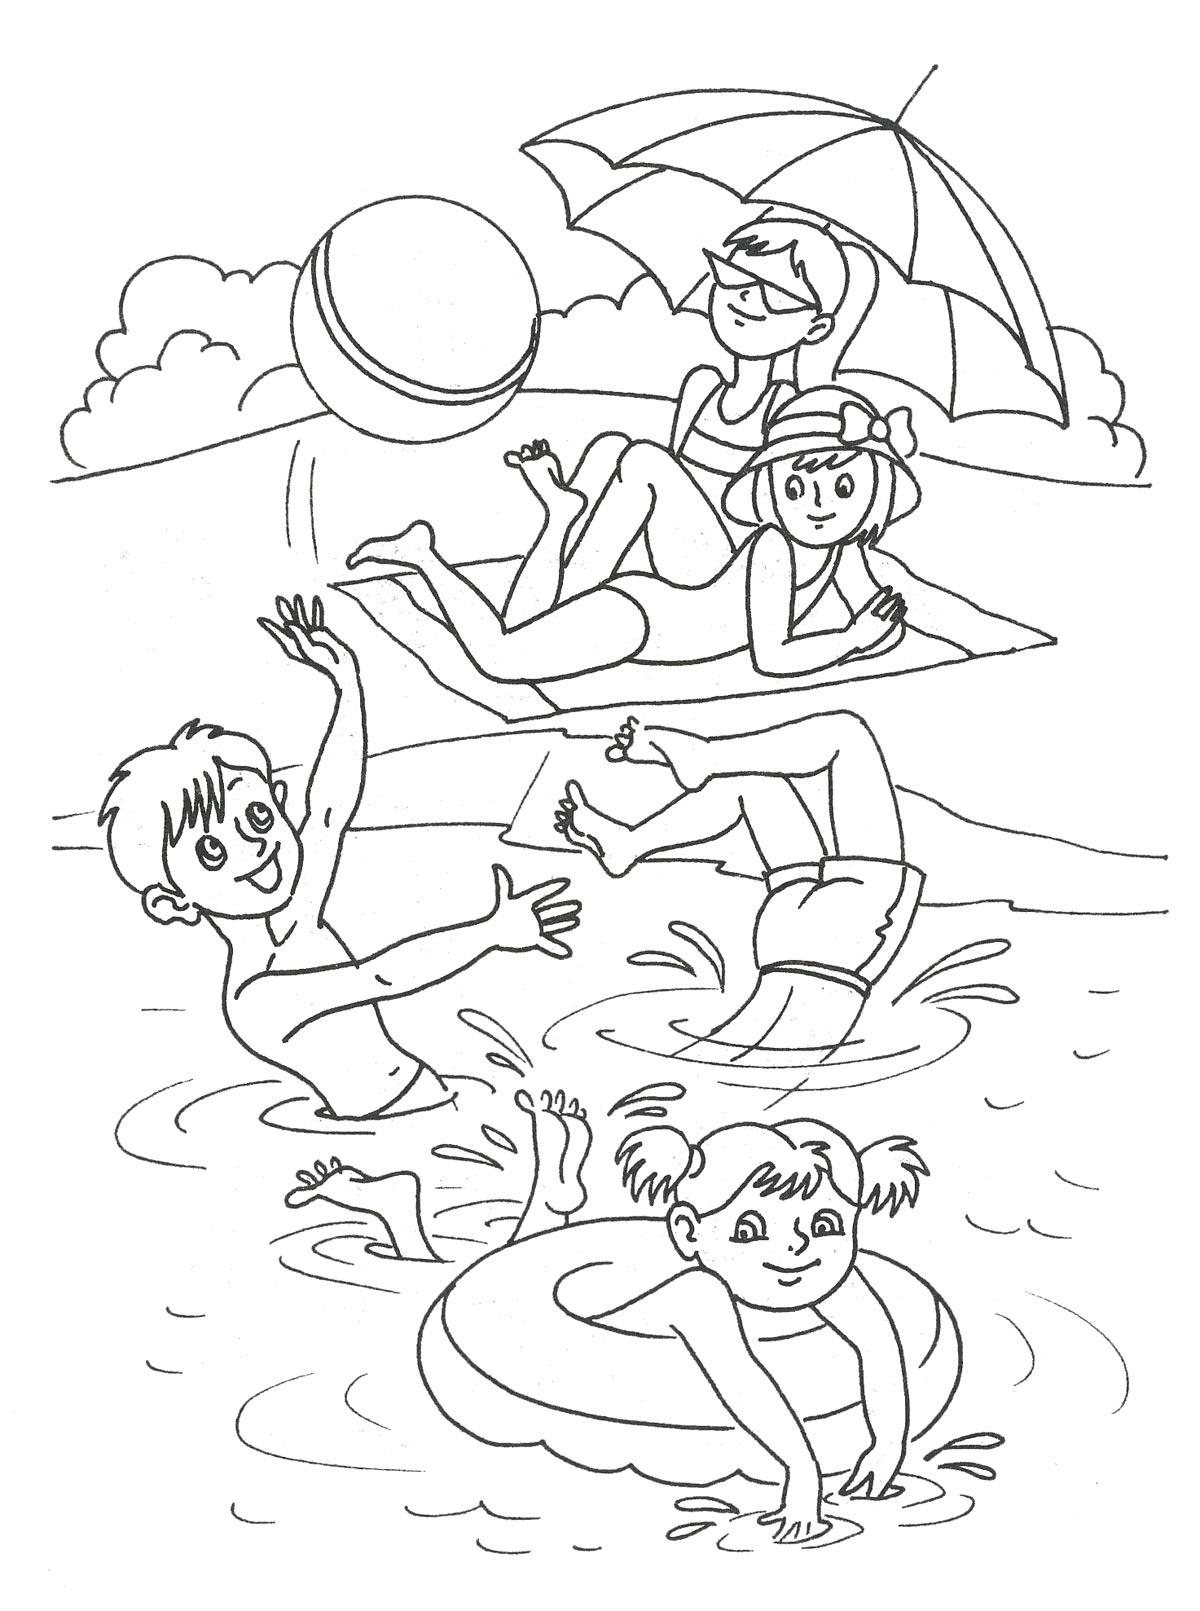 лето раскраски лето раскраски для детей на тему каникулы лето